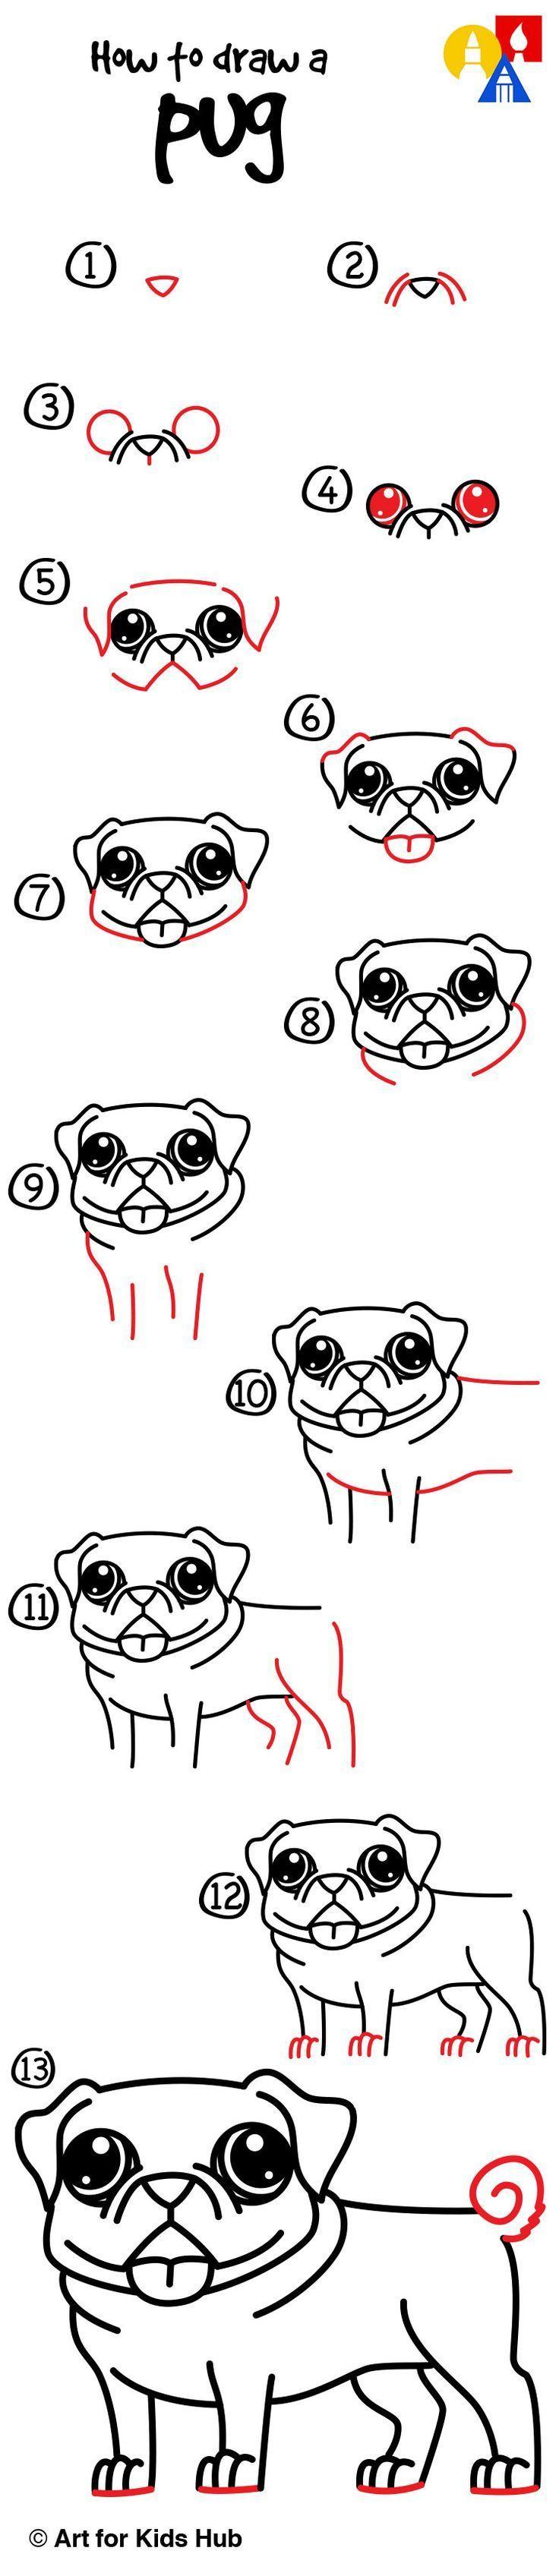 How To Draw A Pug Art For Kids Hub Pug Art Pugs Easy Drawings